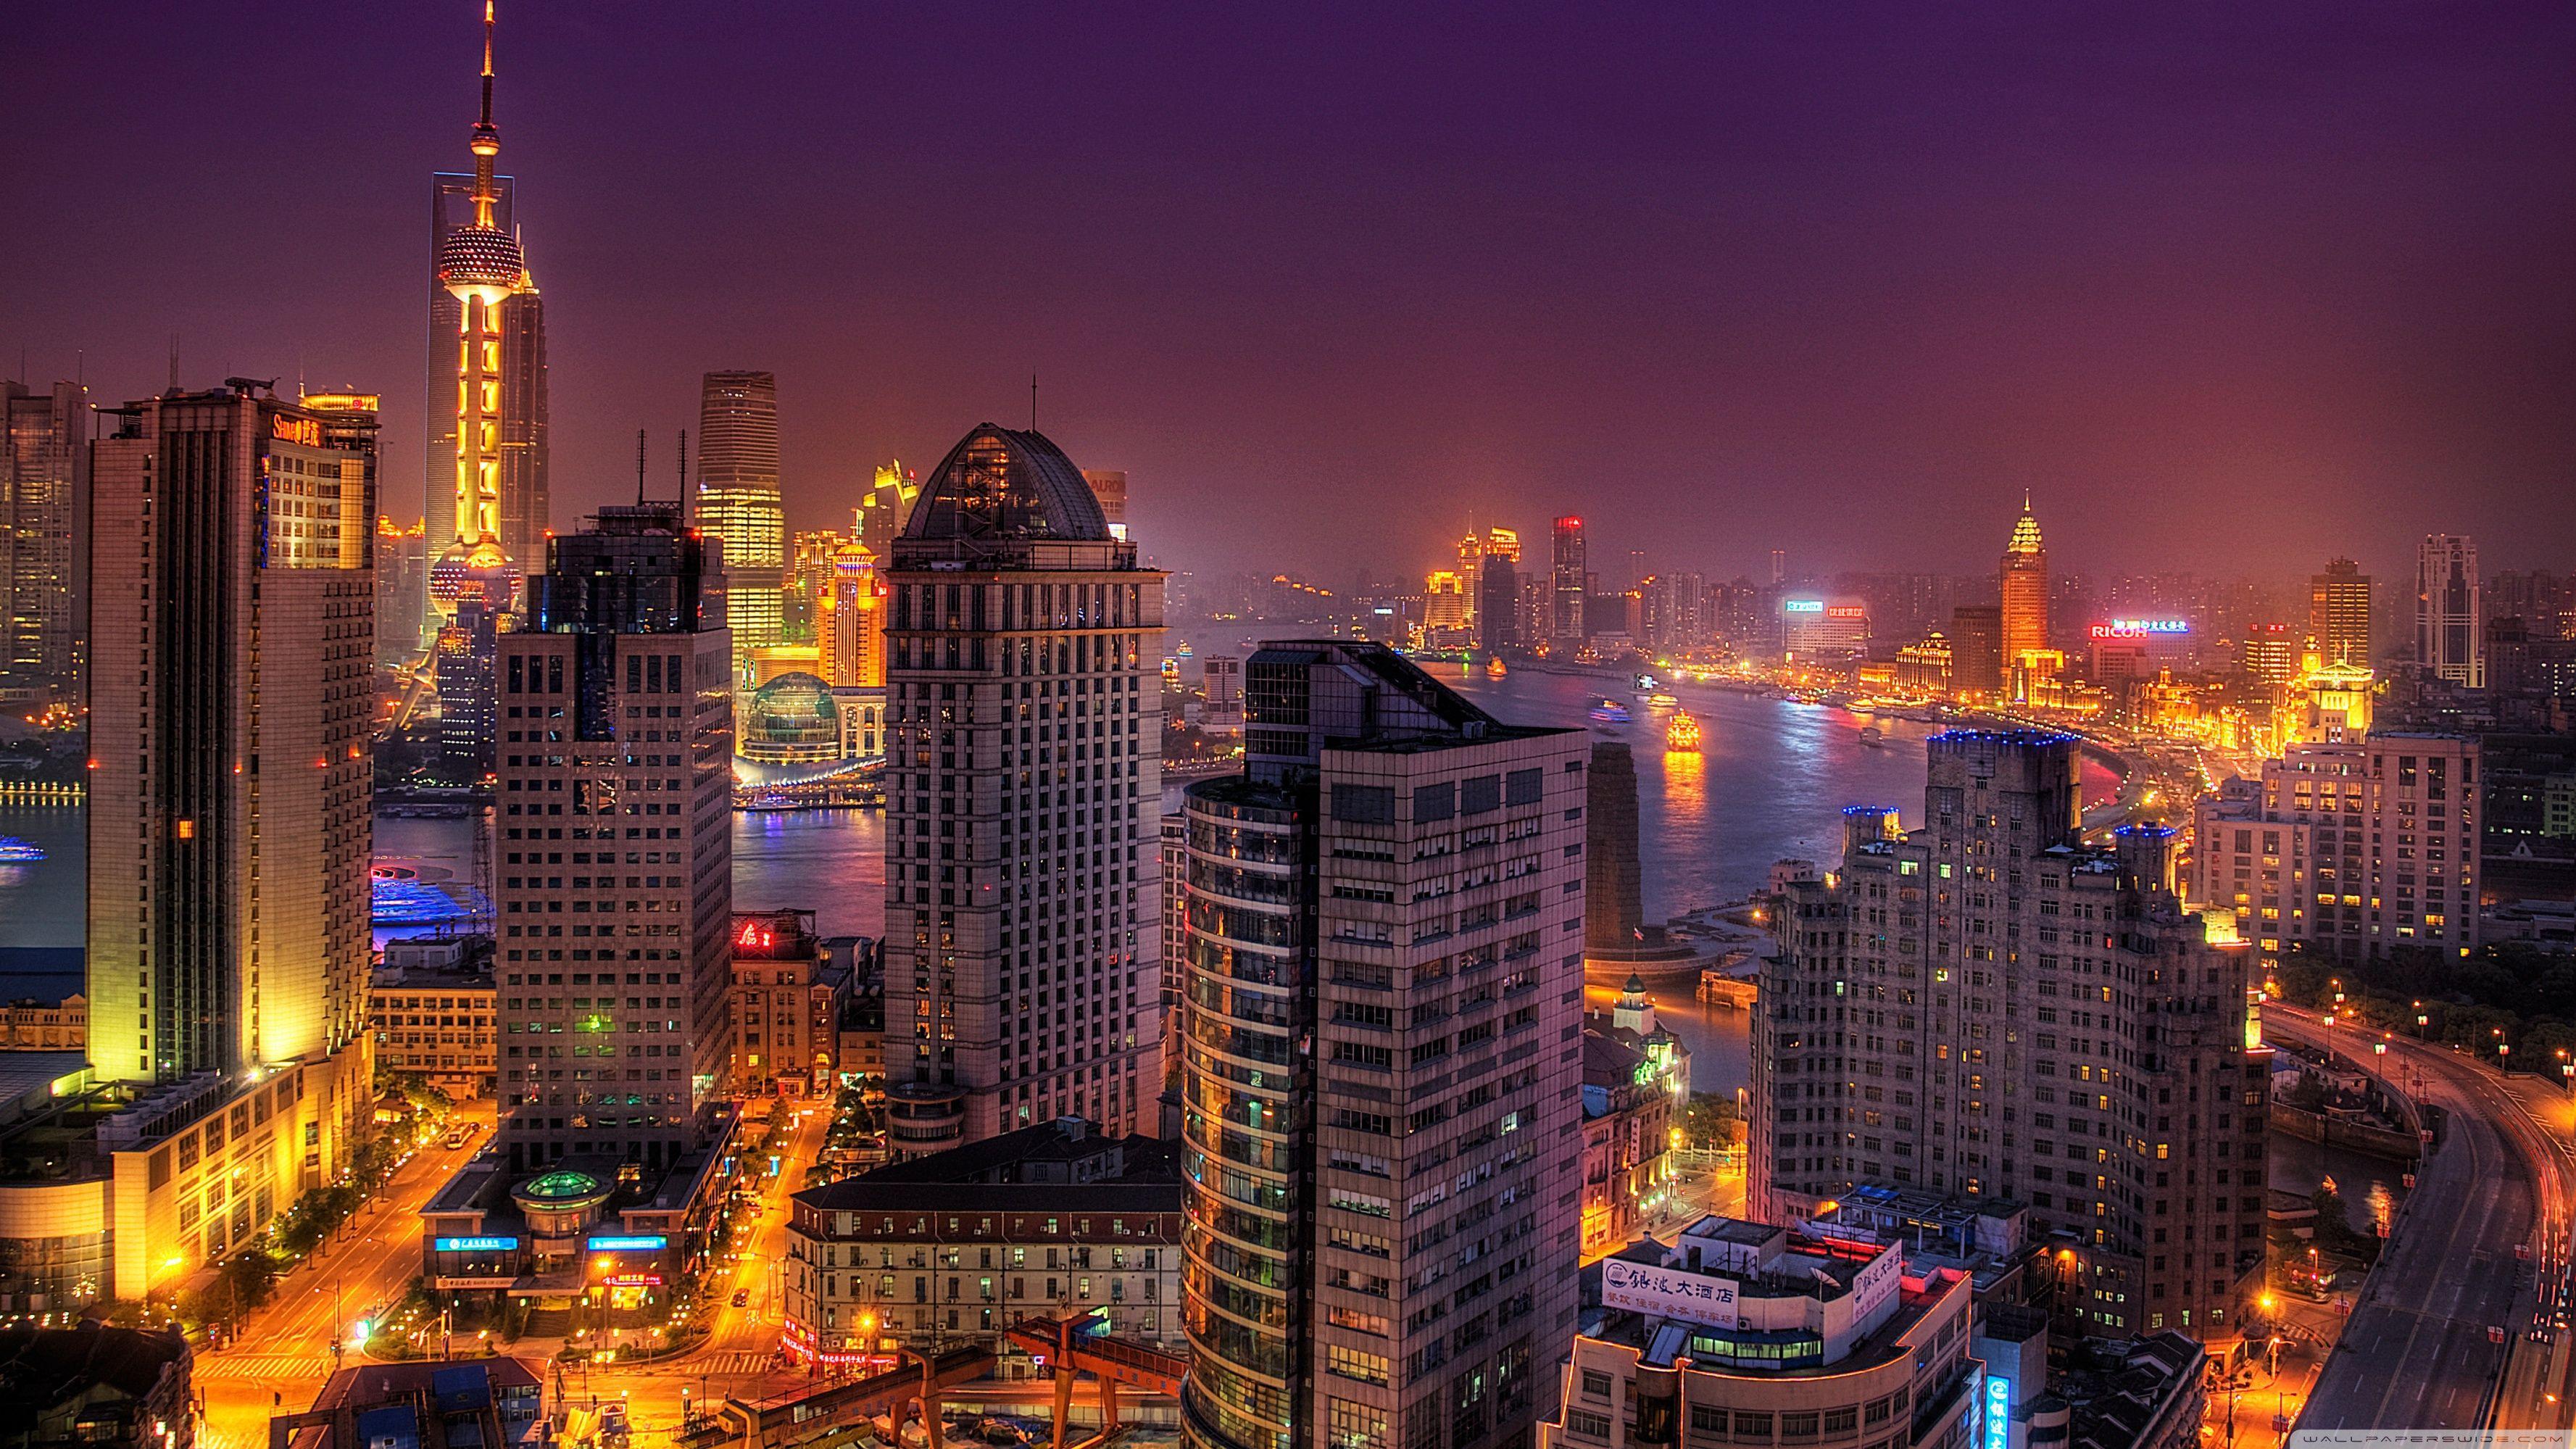 City Lights At Night Wallpapers Top Free City Lights At